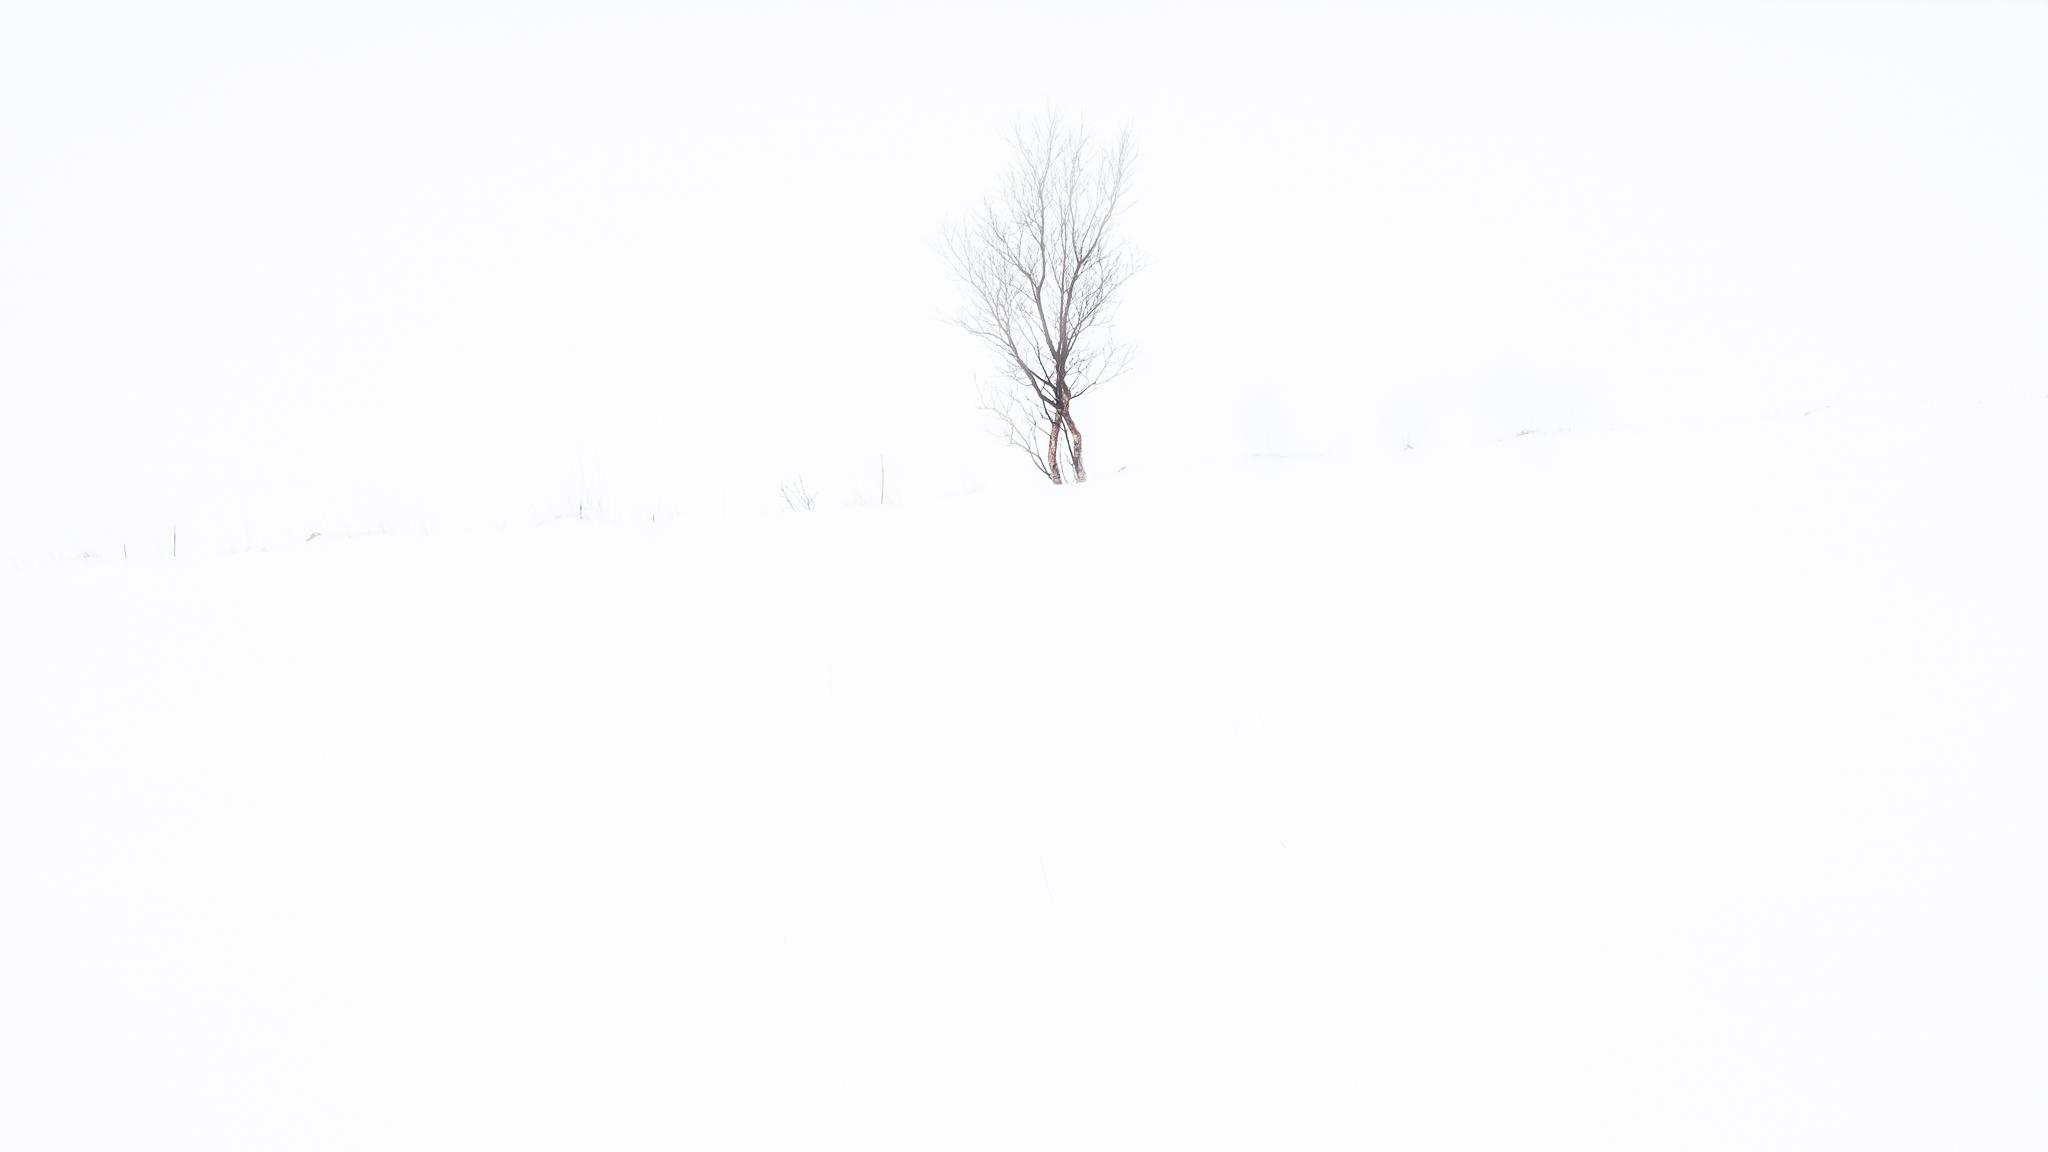 Birch tree, Vareid, Lofoten, Norway, 2016. From the series    Arctic Light